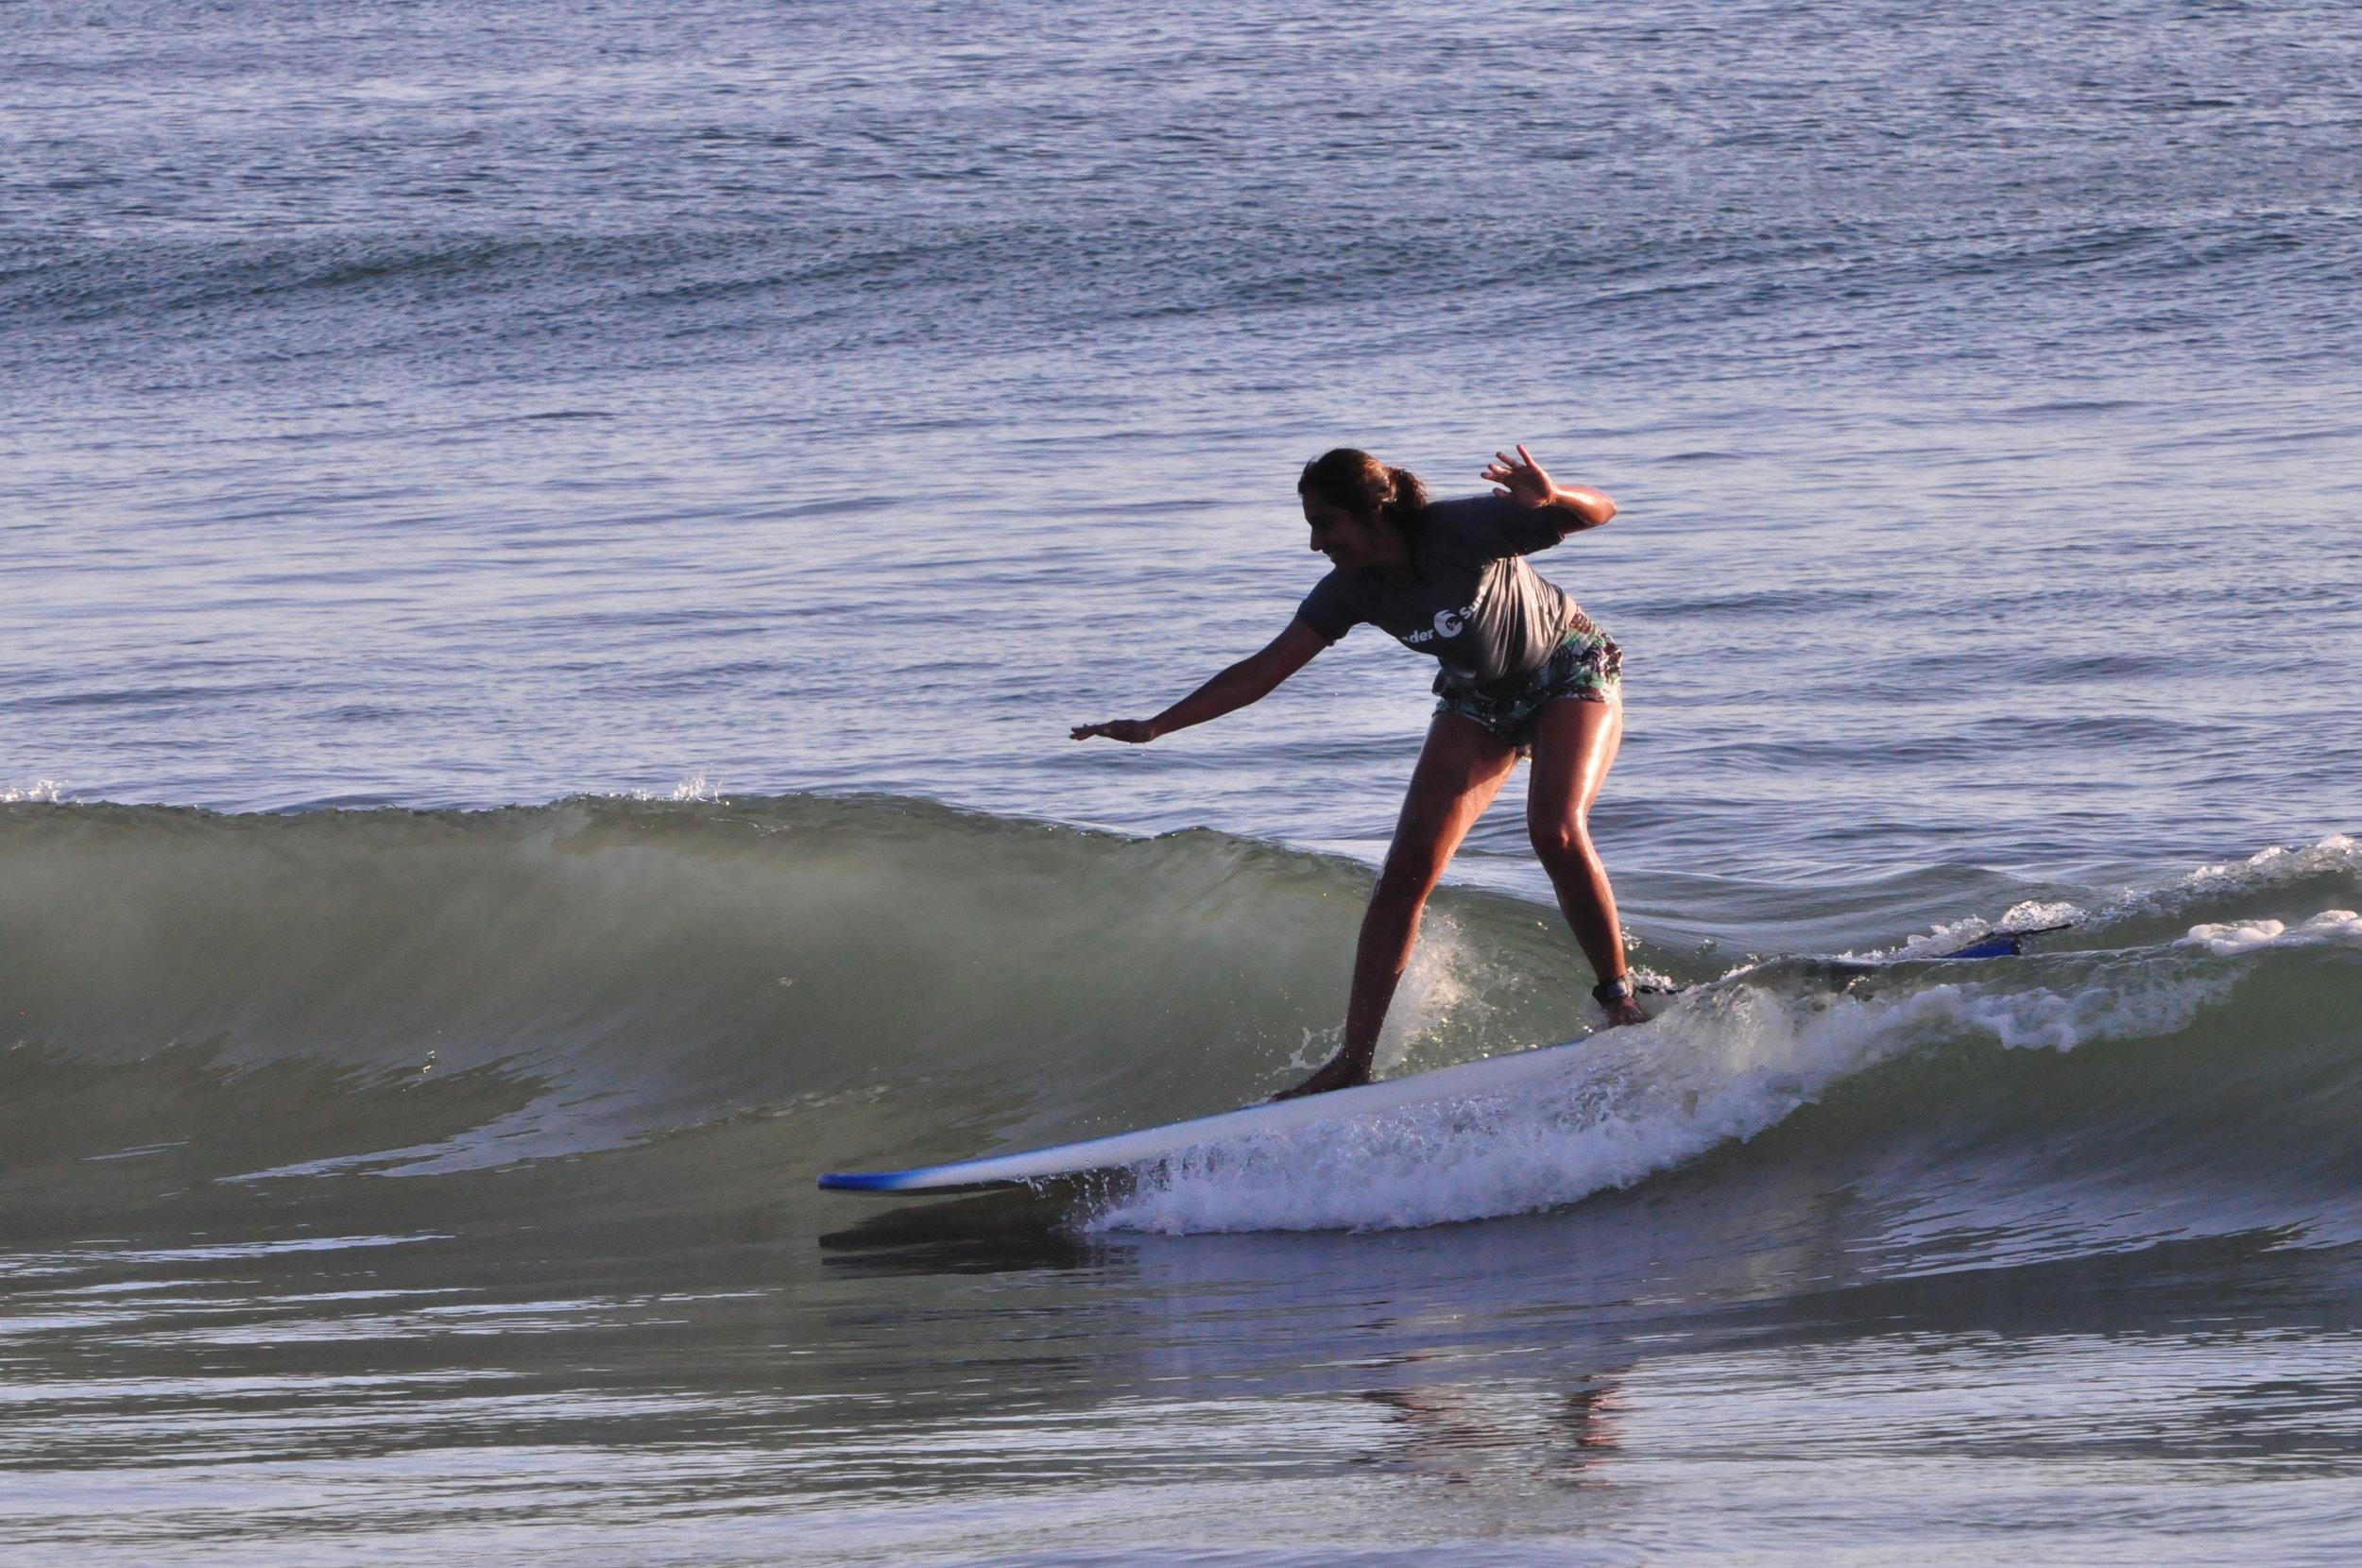 Suhana Surfing